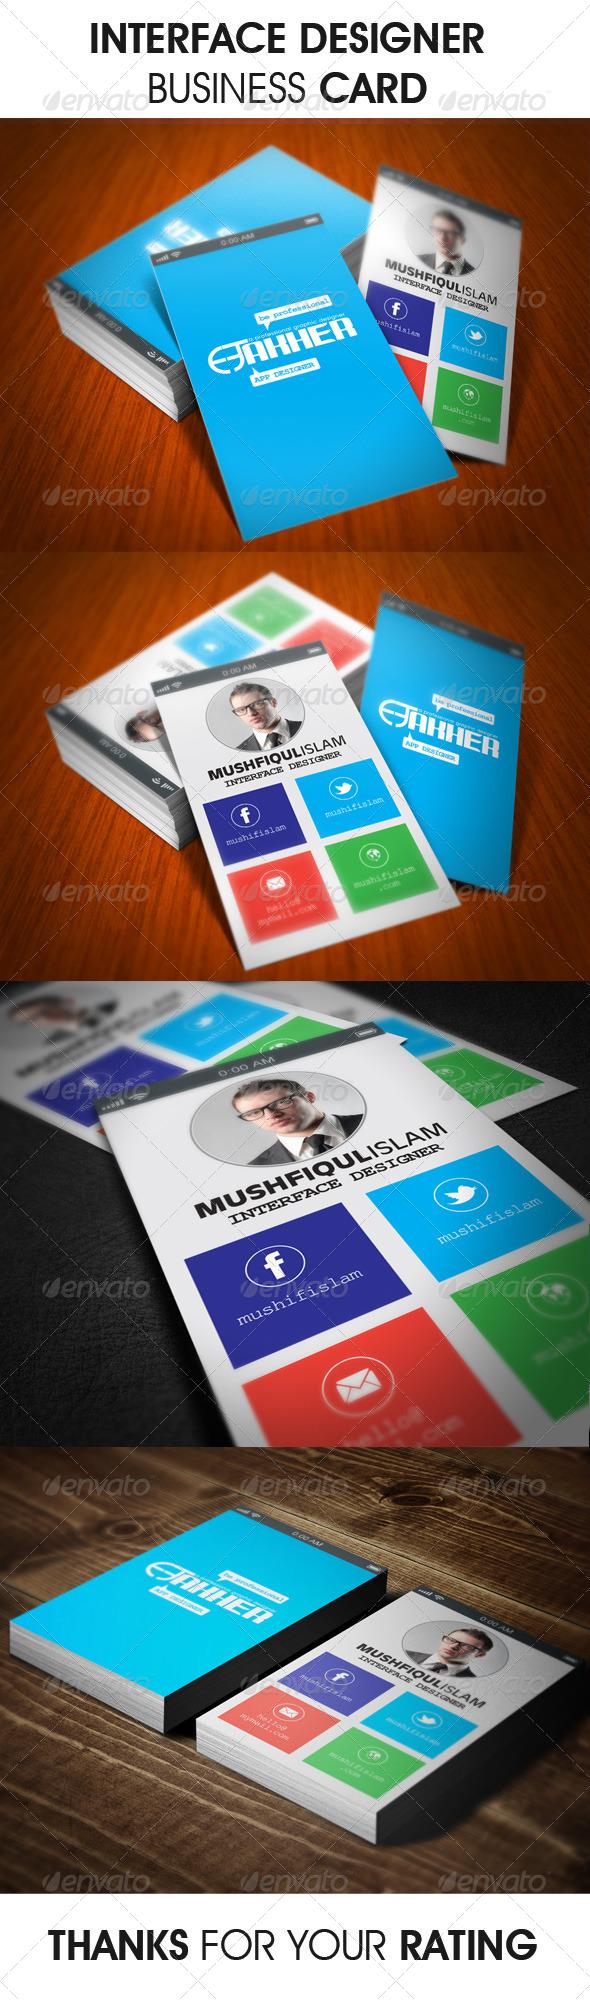 Interface Designer Business Card - Business Cards Print Templates